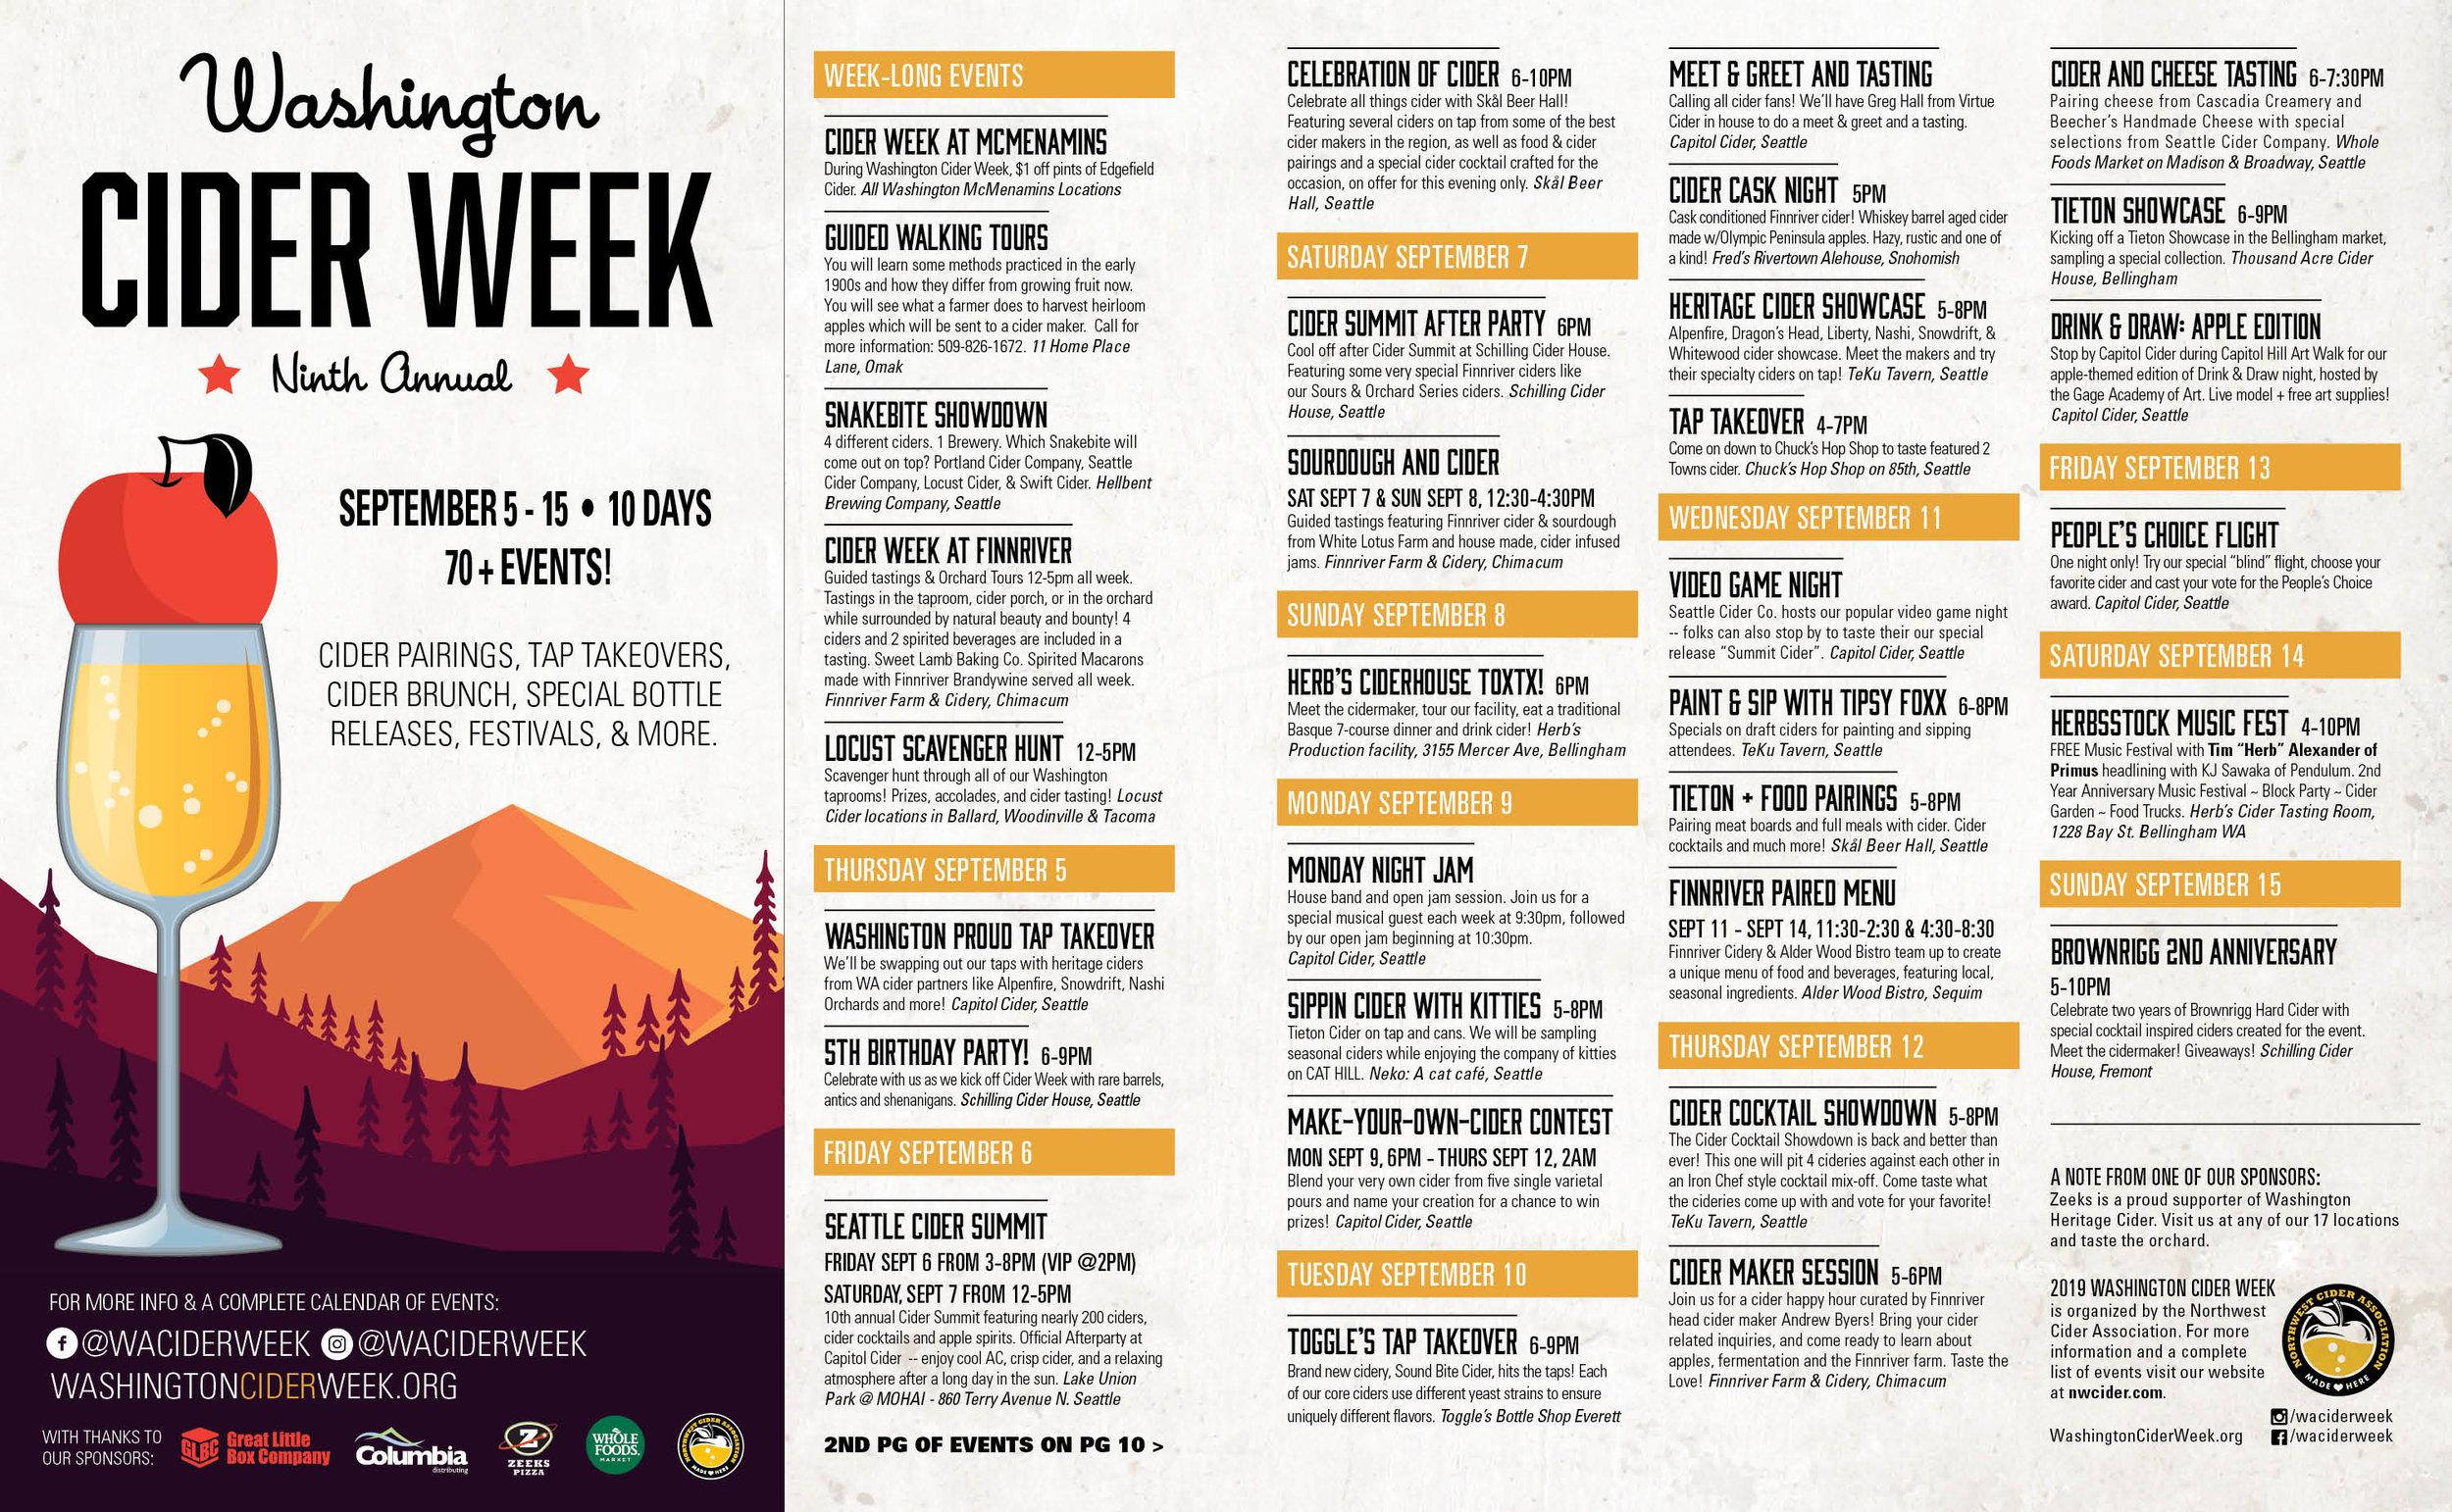 WA Cider Week Stranger Ad 2019 7.jpg